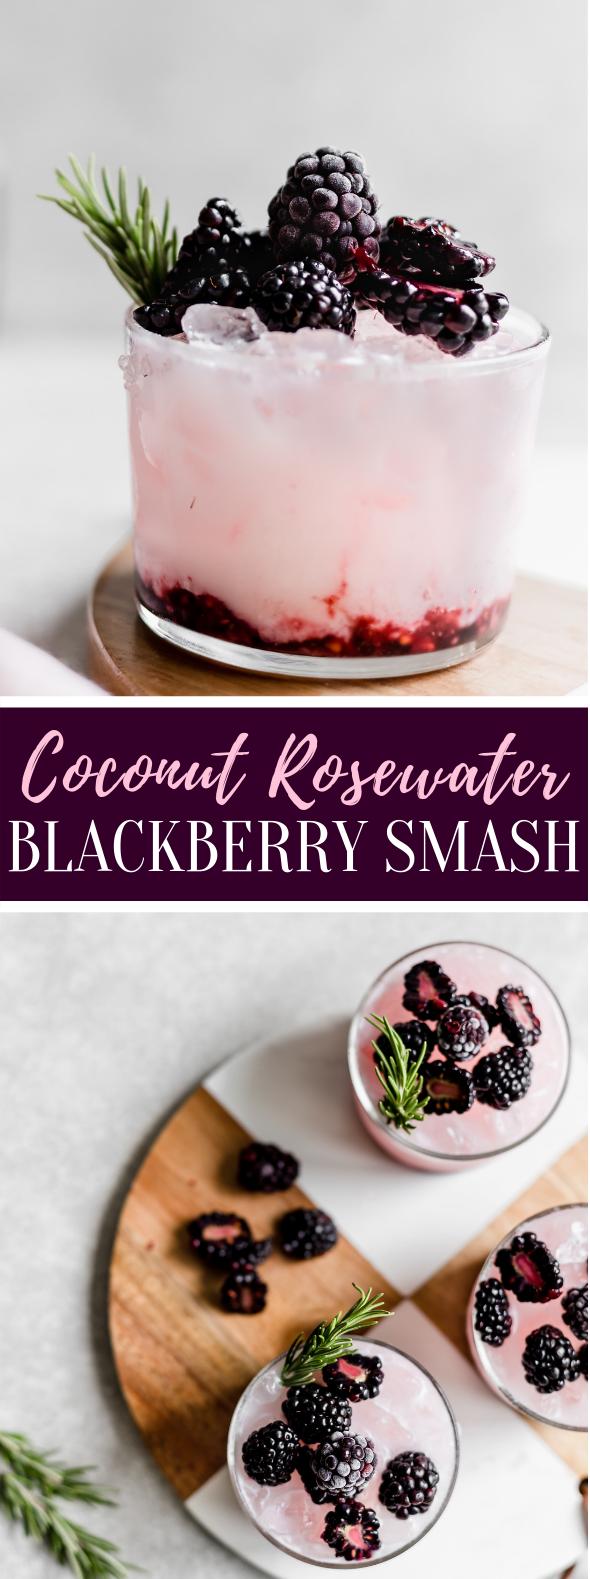 COCONUT ROSEWATER BLACKBERRY SMASH #drinks #cocktails